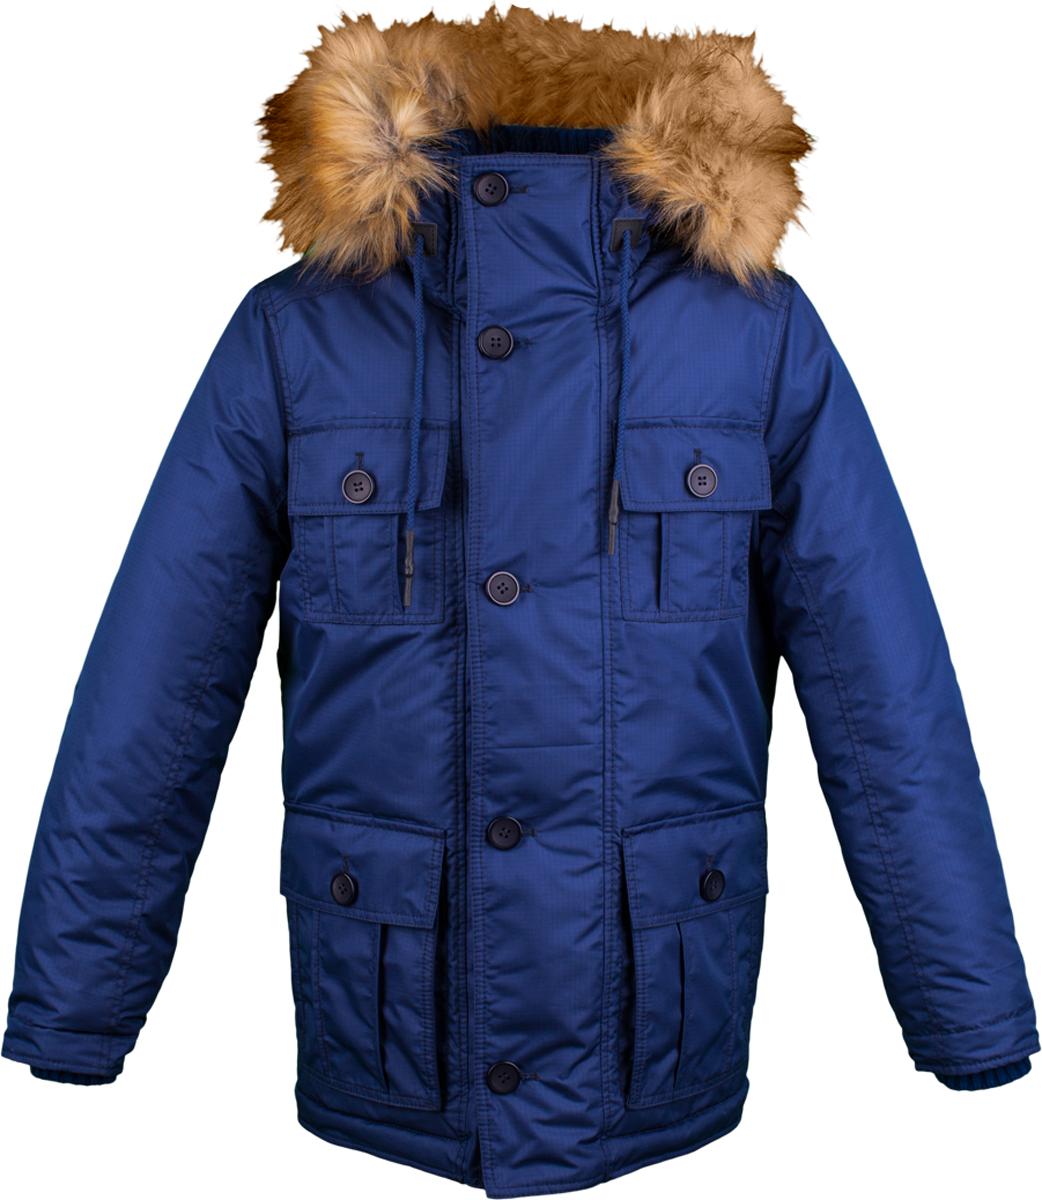 Куртка Boom! куртка для мальчика boom цвет хаки 80543 bob размер 152